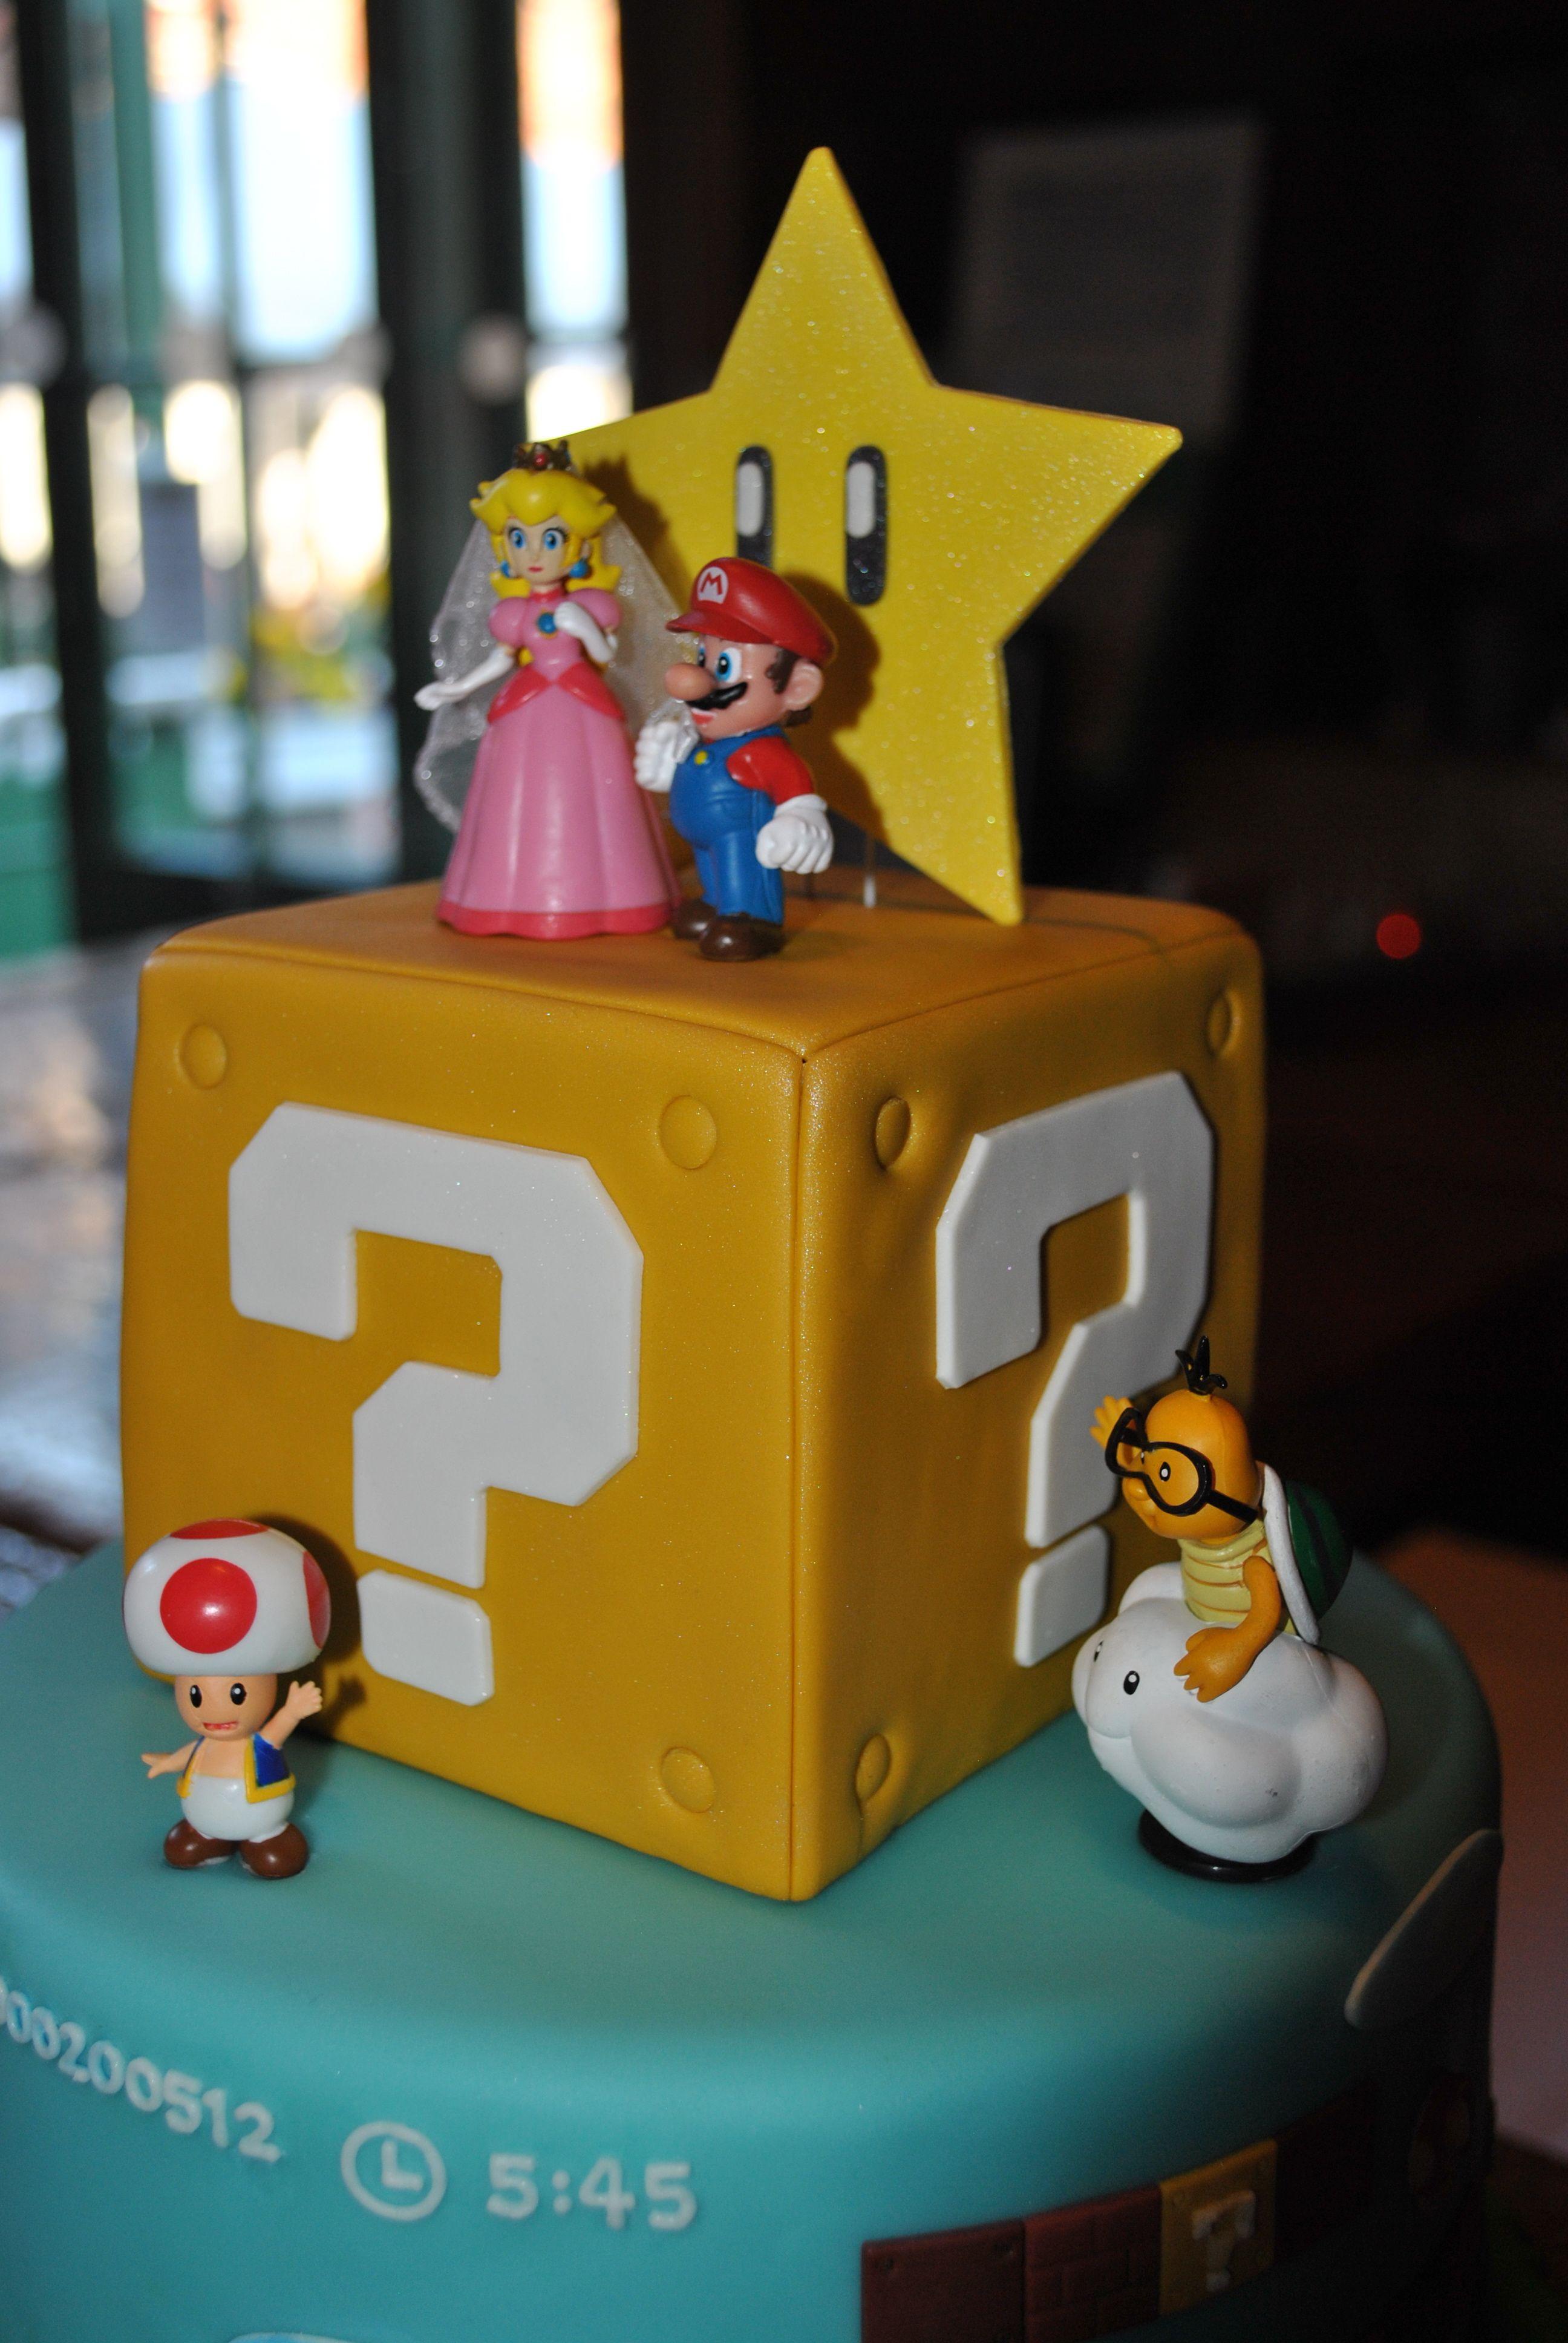 Super Mario wedding cake toppers | Til death do us part | Pinterest ...